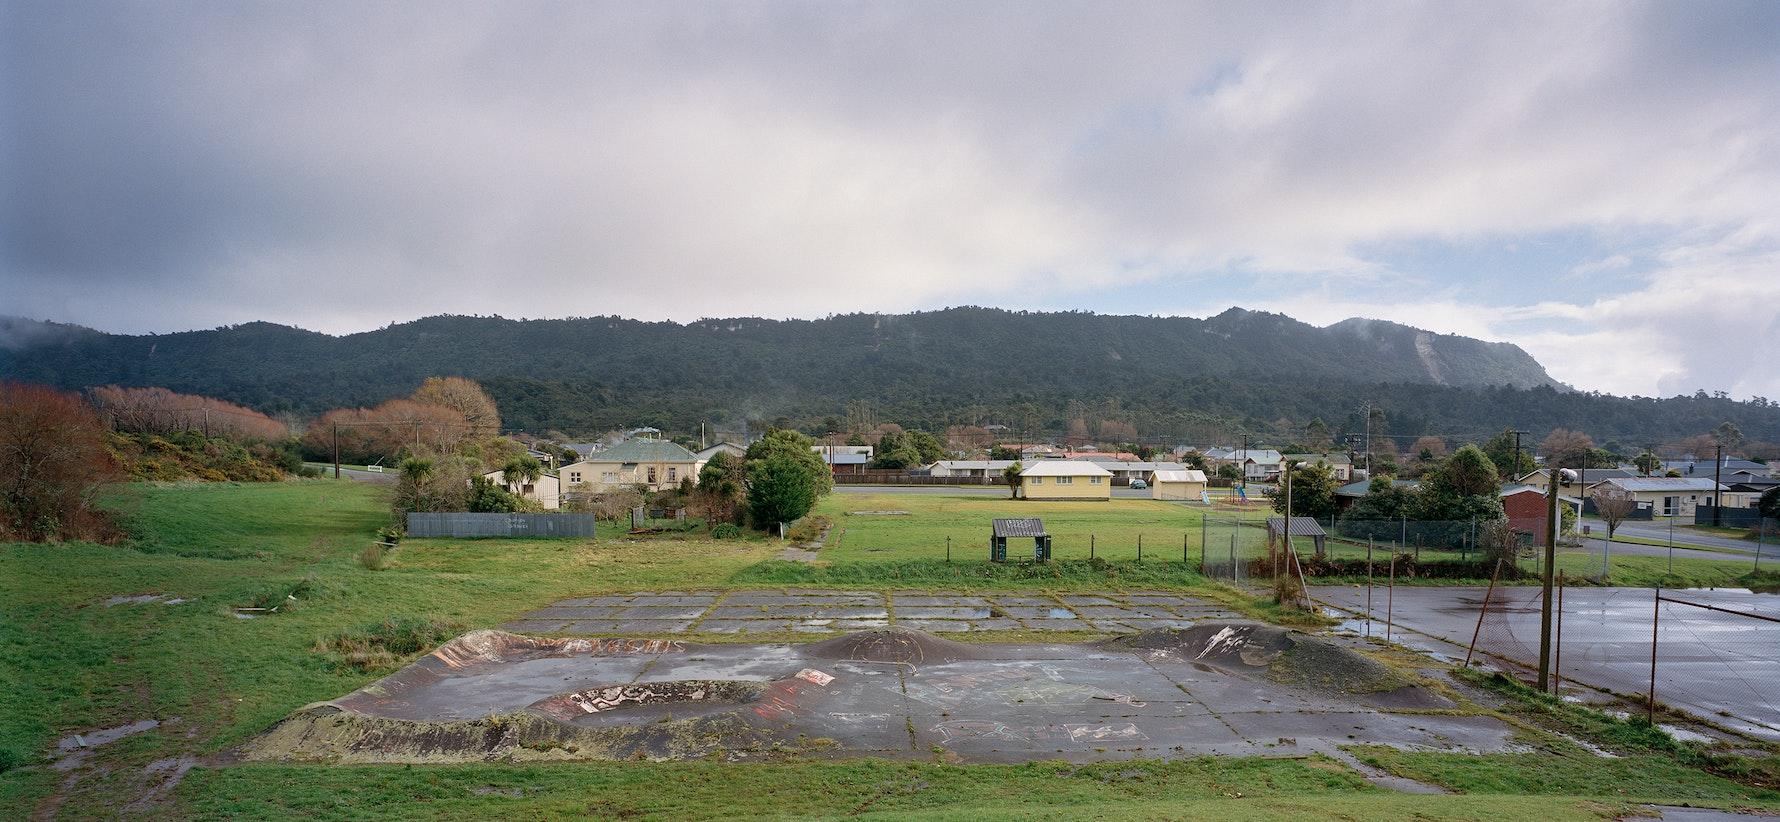 Runanga 'skate park', looking toward Rapahoe Range, 2015